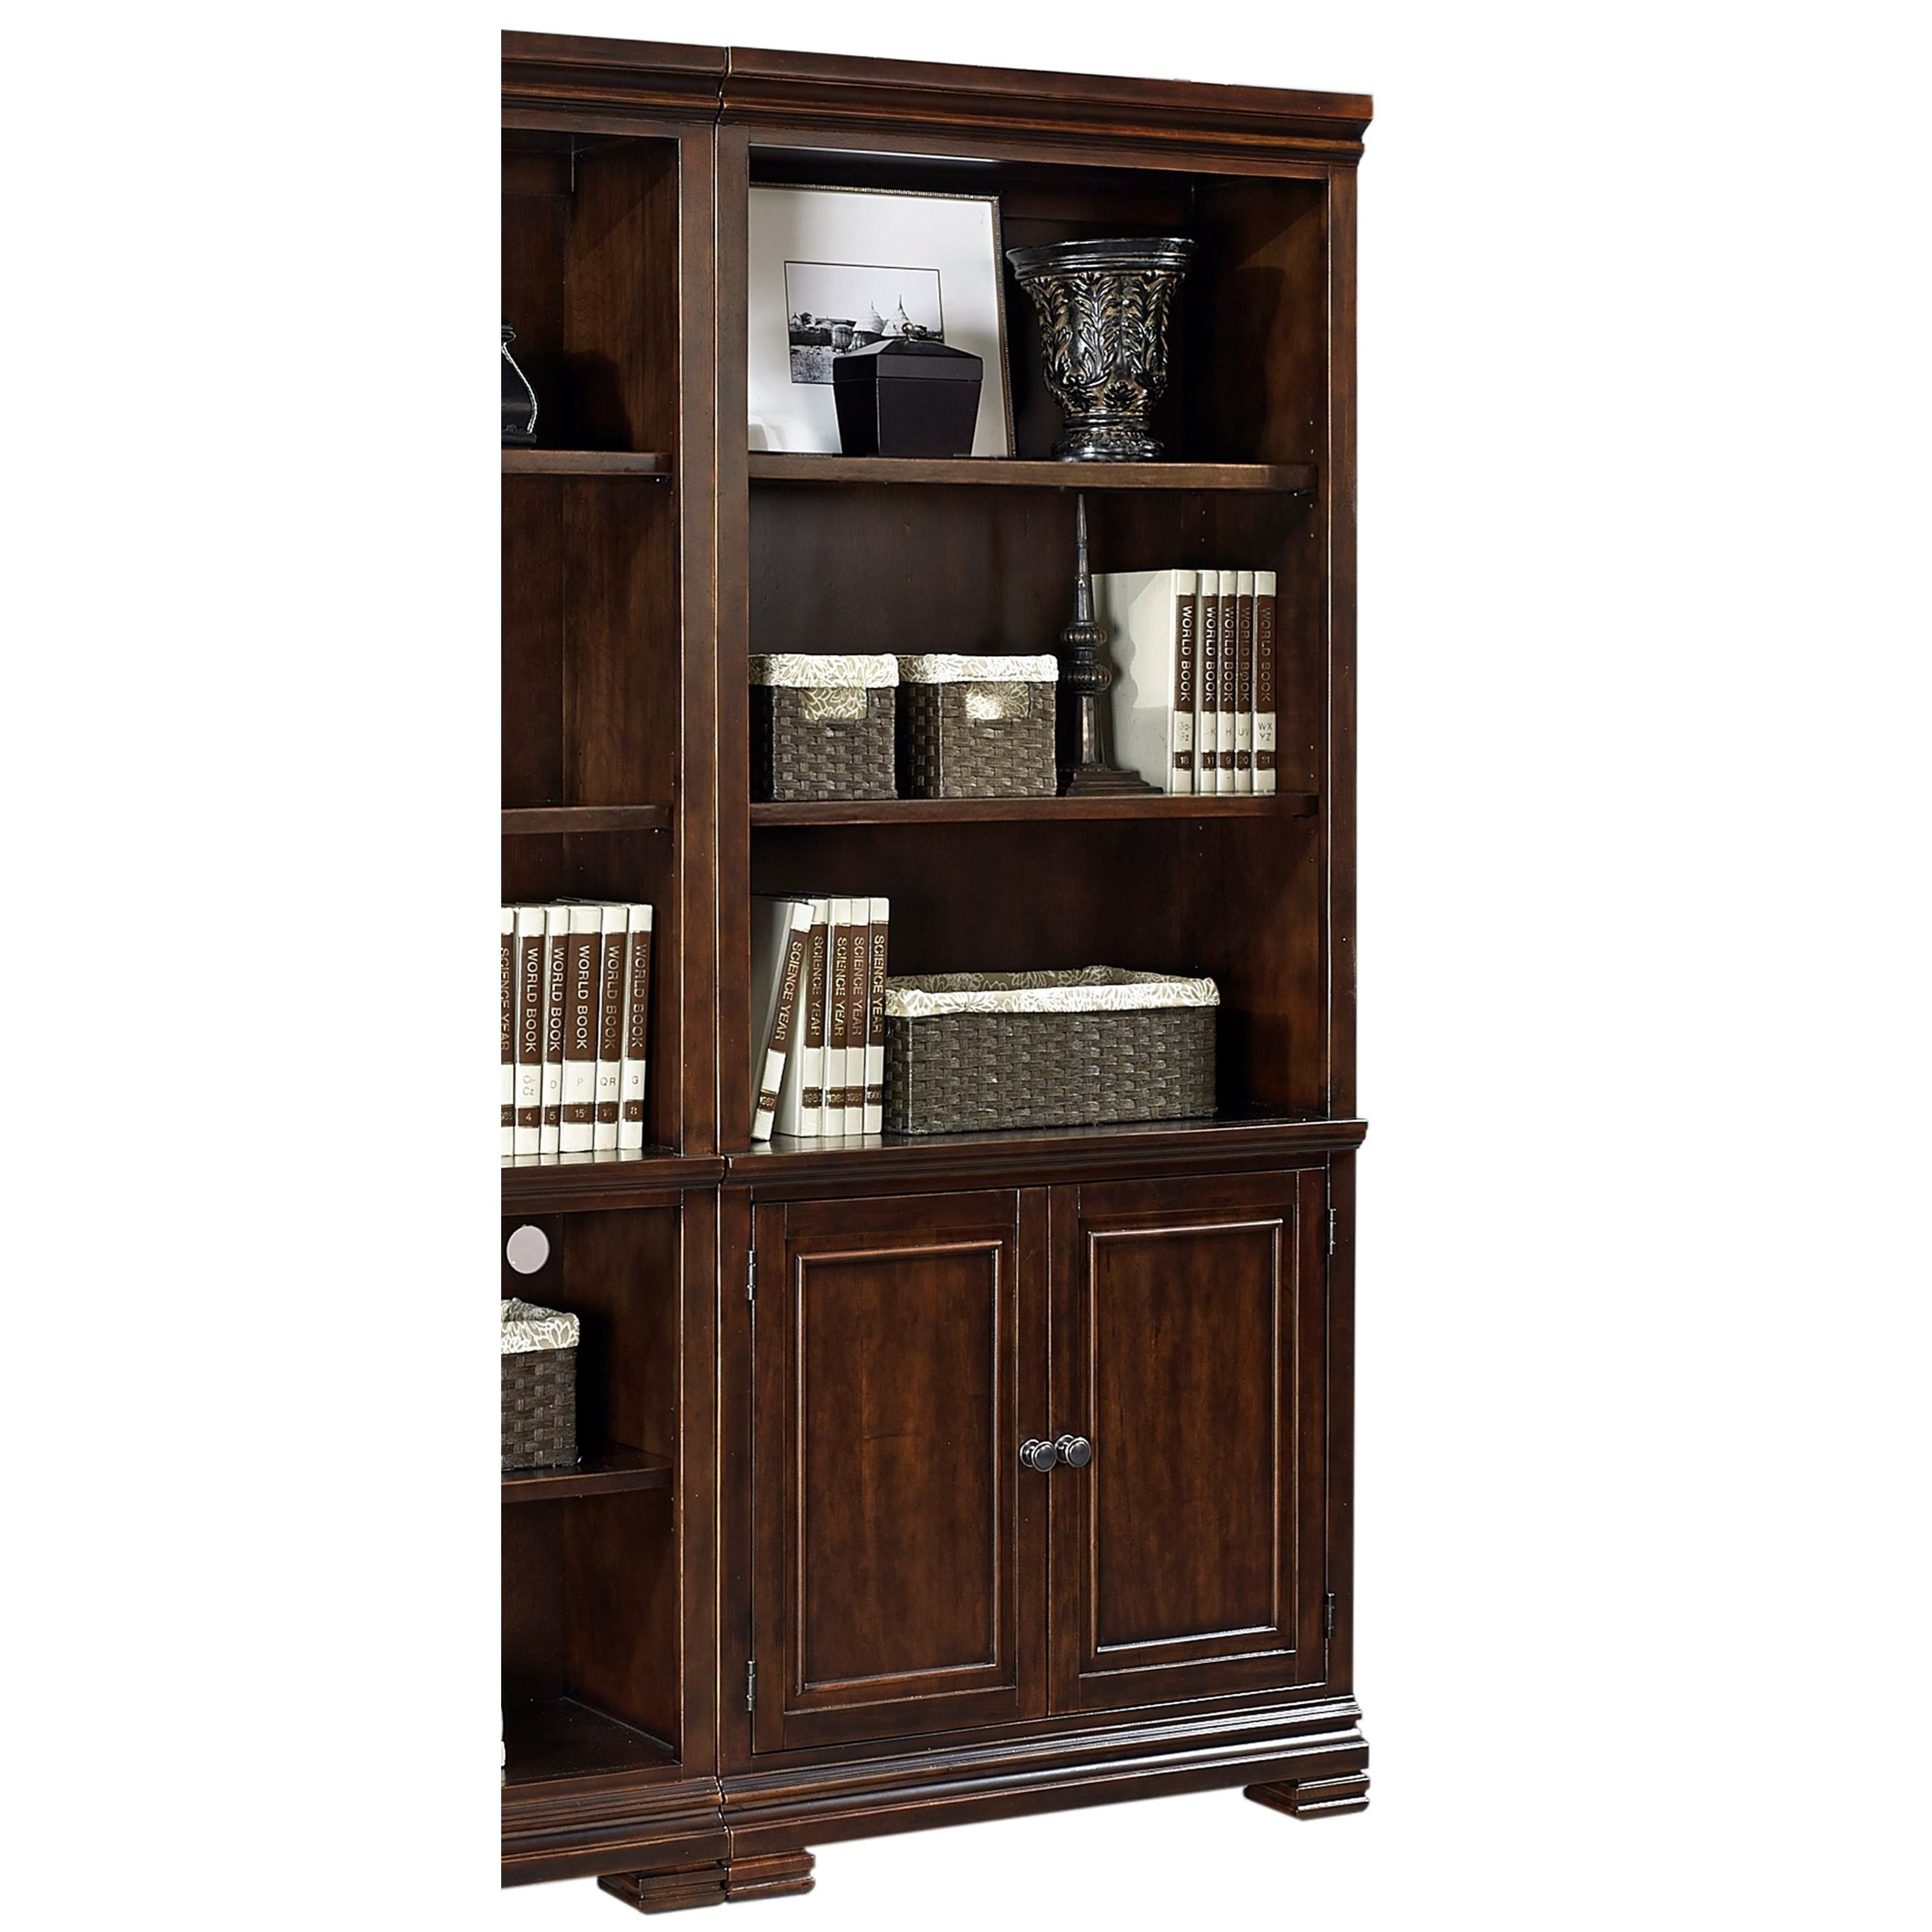 Weston Door Bookcase by Aspenhome at Walker's Furniture